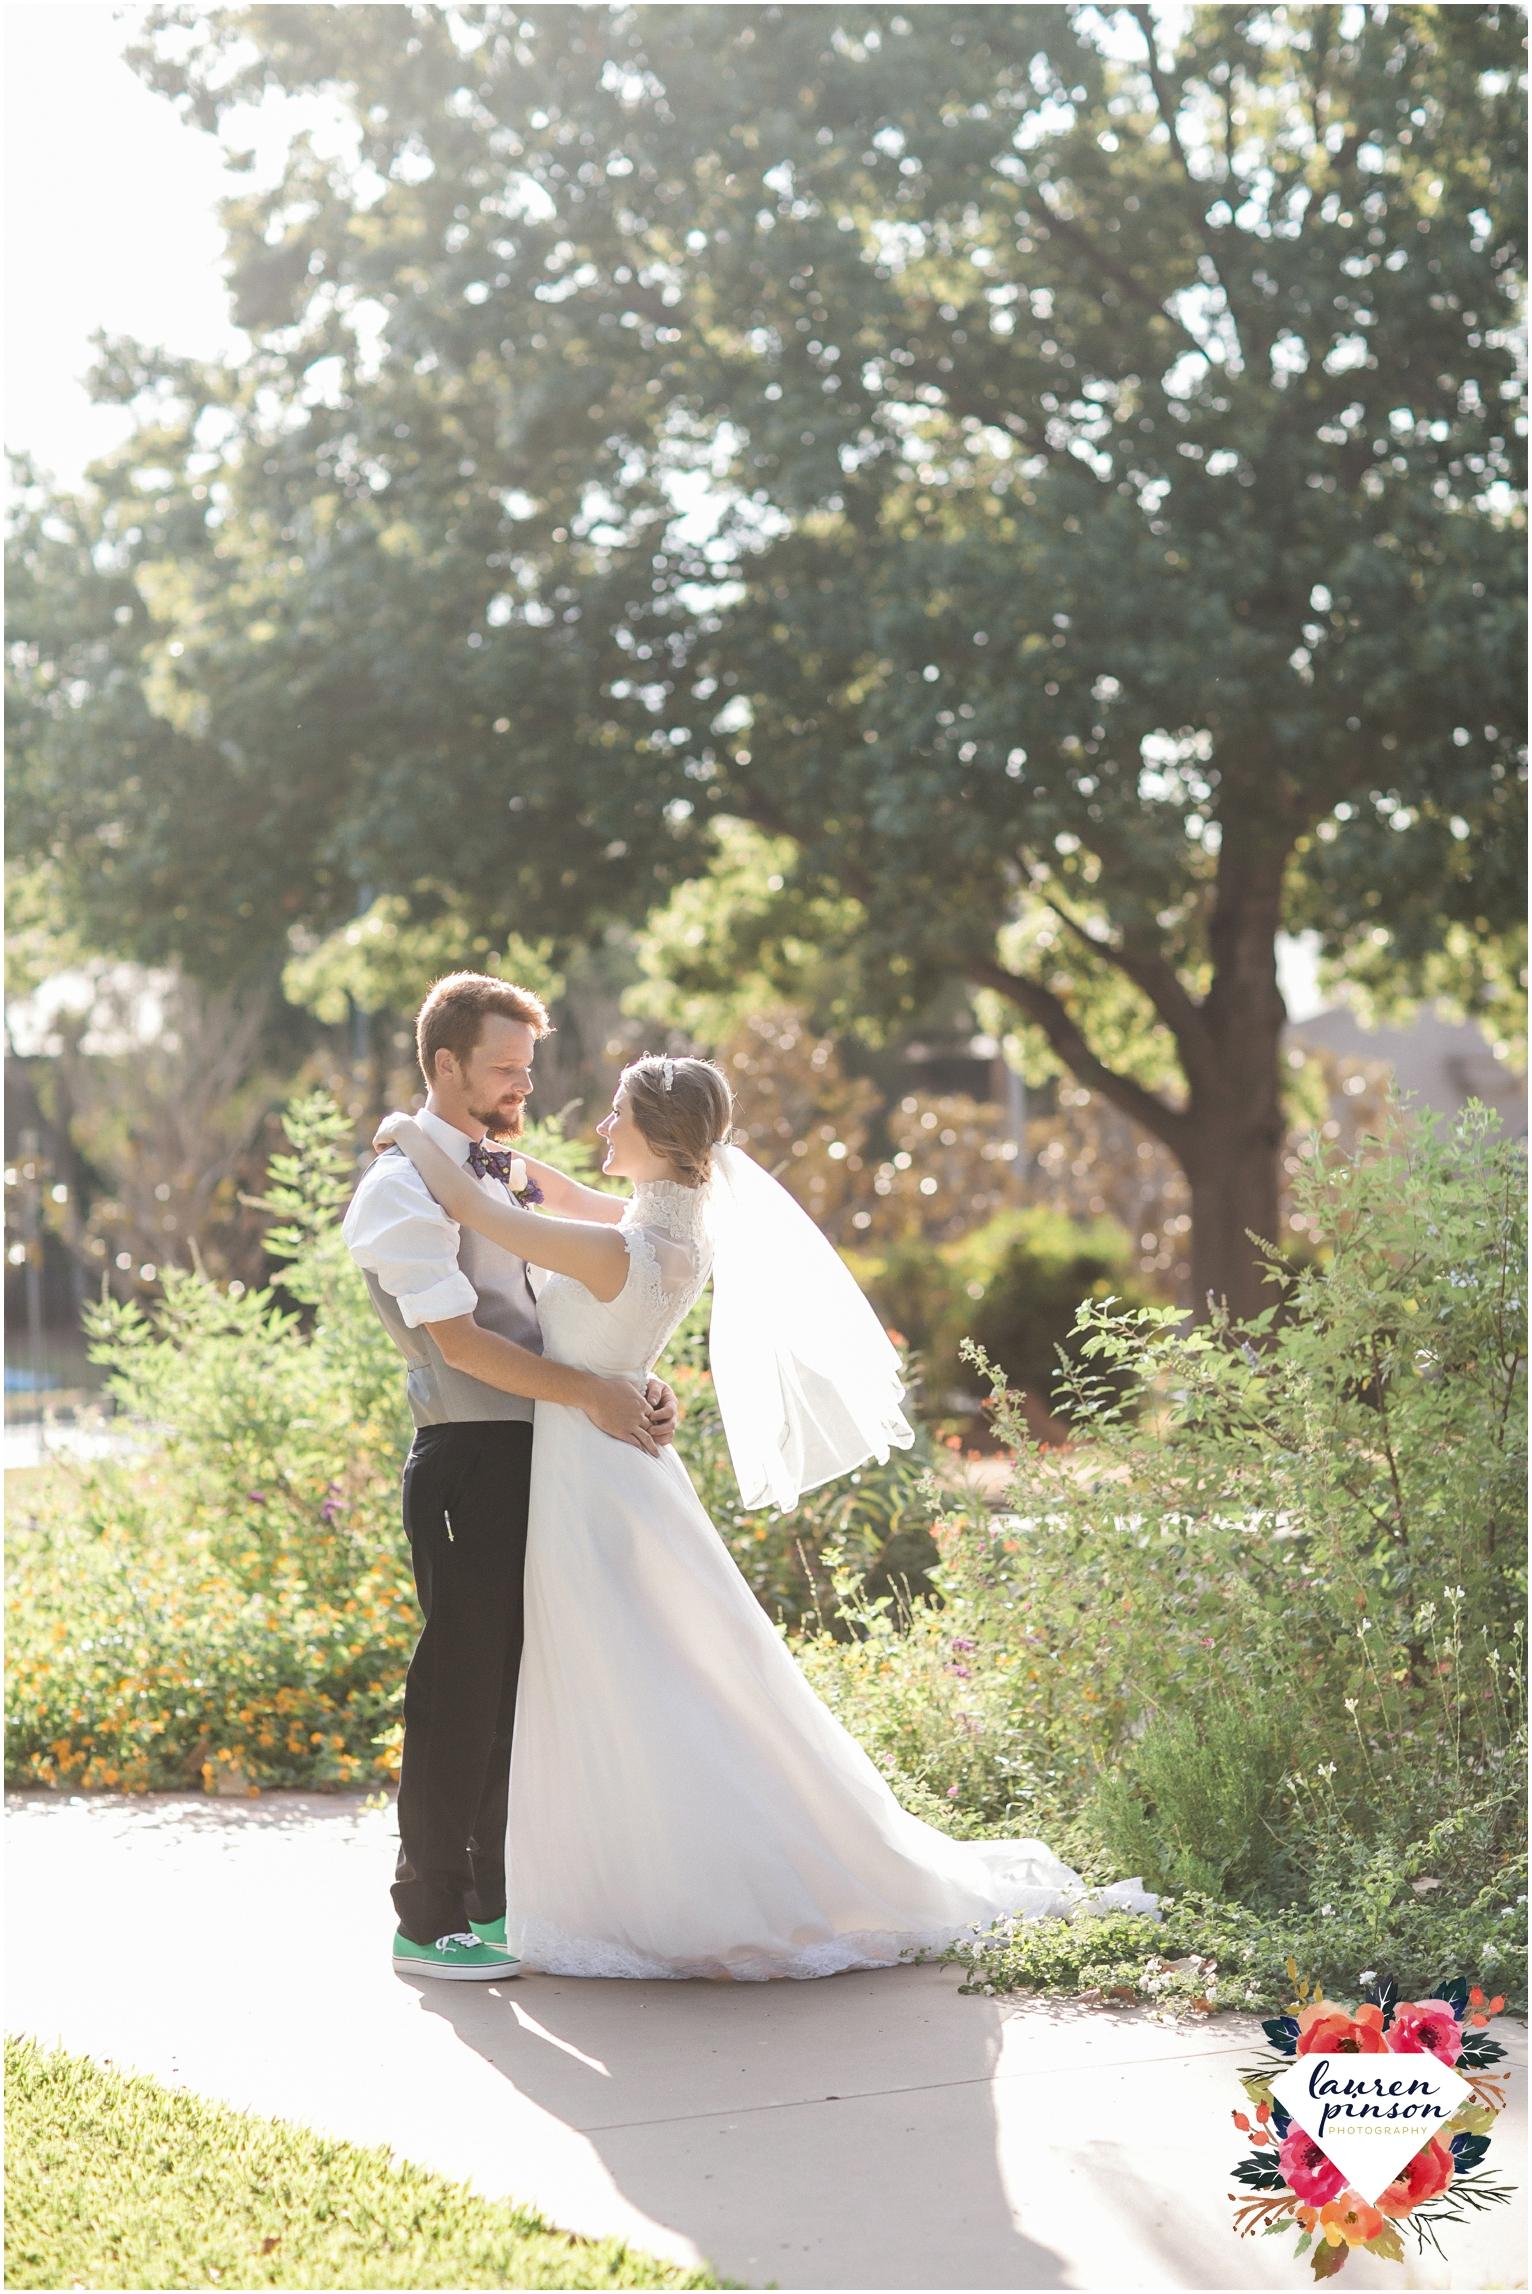 wichita-falls-wedding-photography-at-fain-presbyterian-church-and-the-wellington-timeless-classic-modern-photographer_1249.jpg